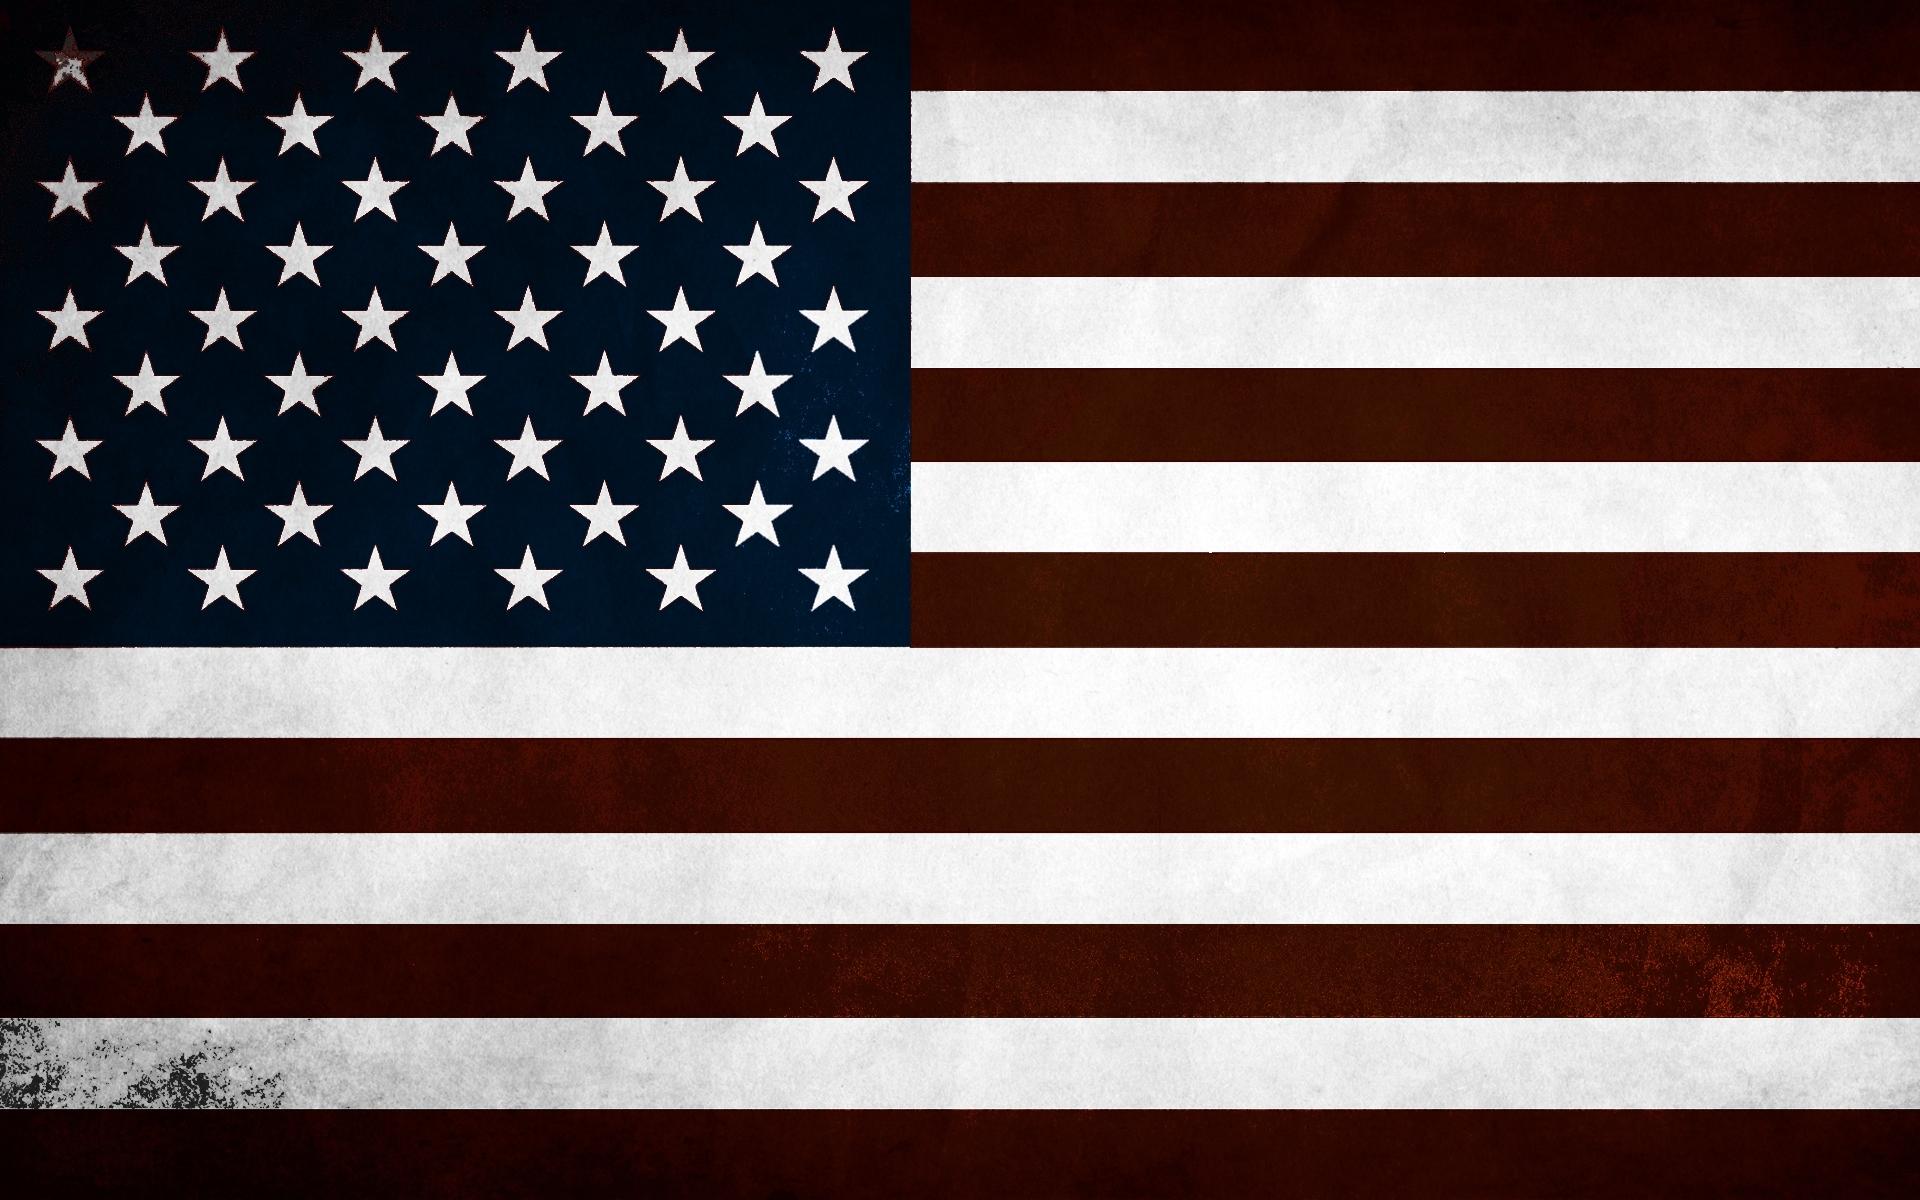 american flag wallpapers hd | pixelstalk